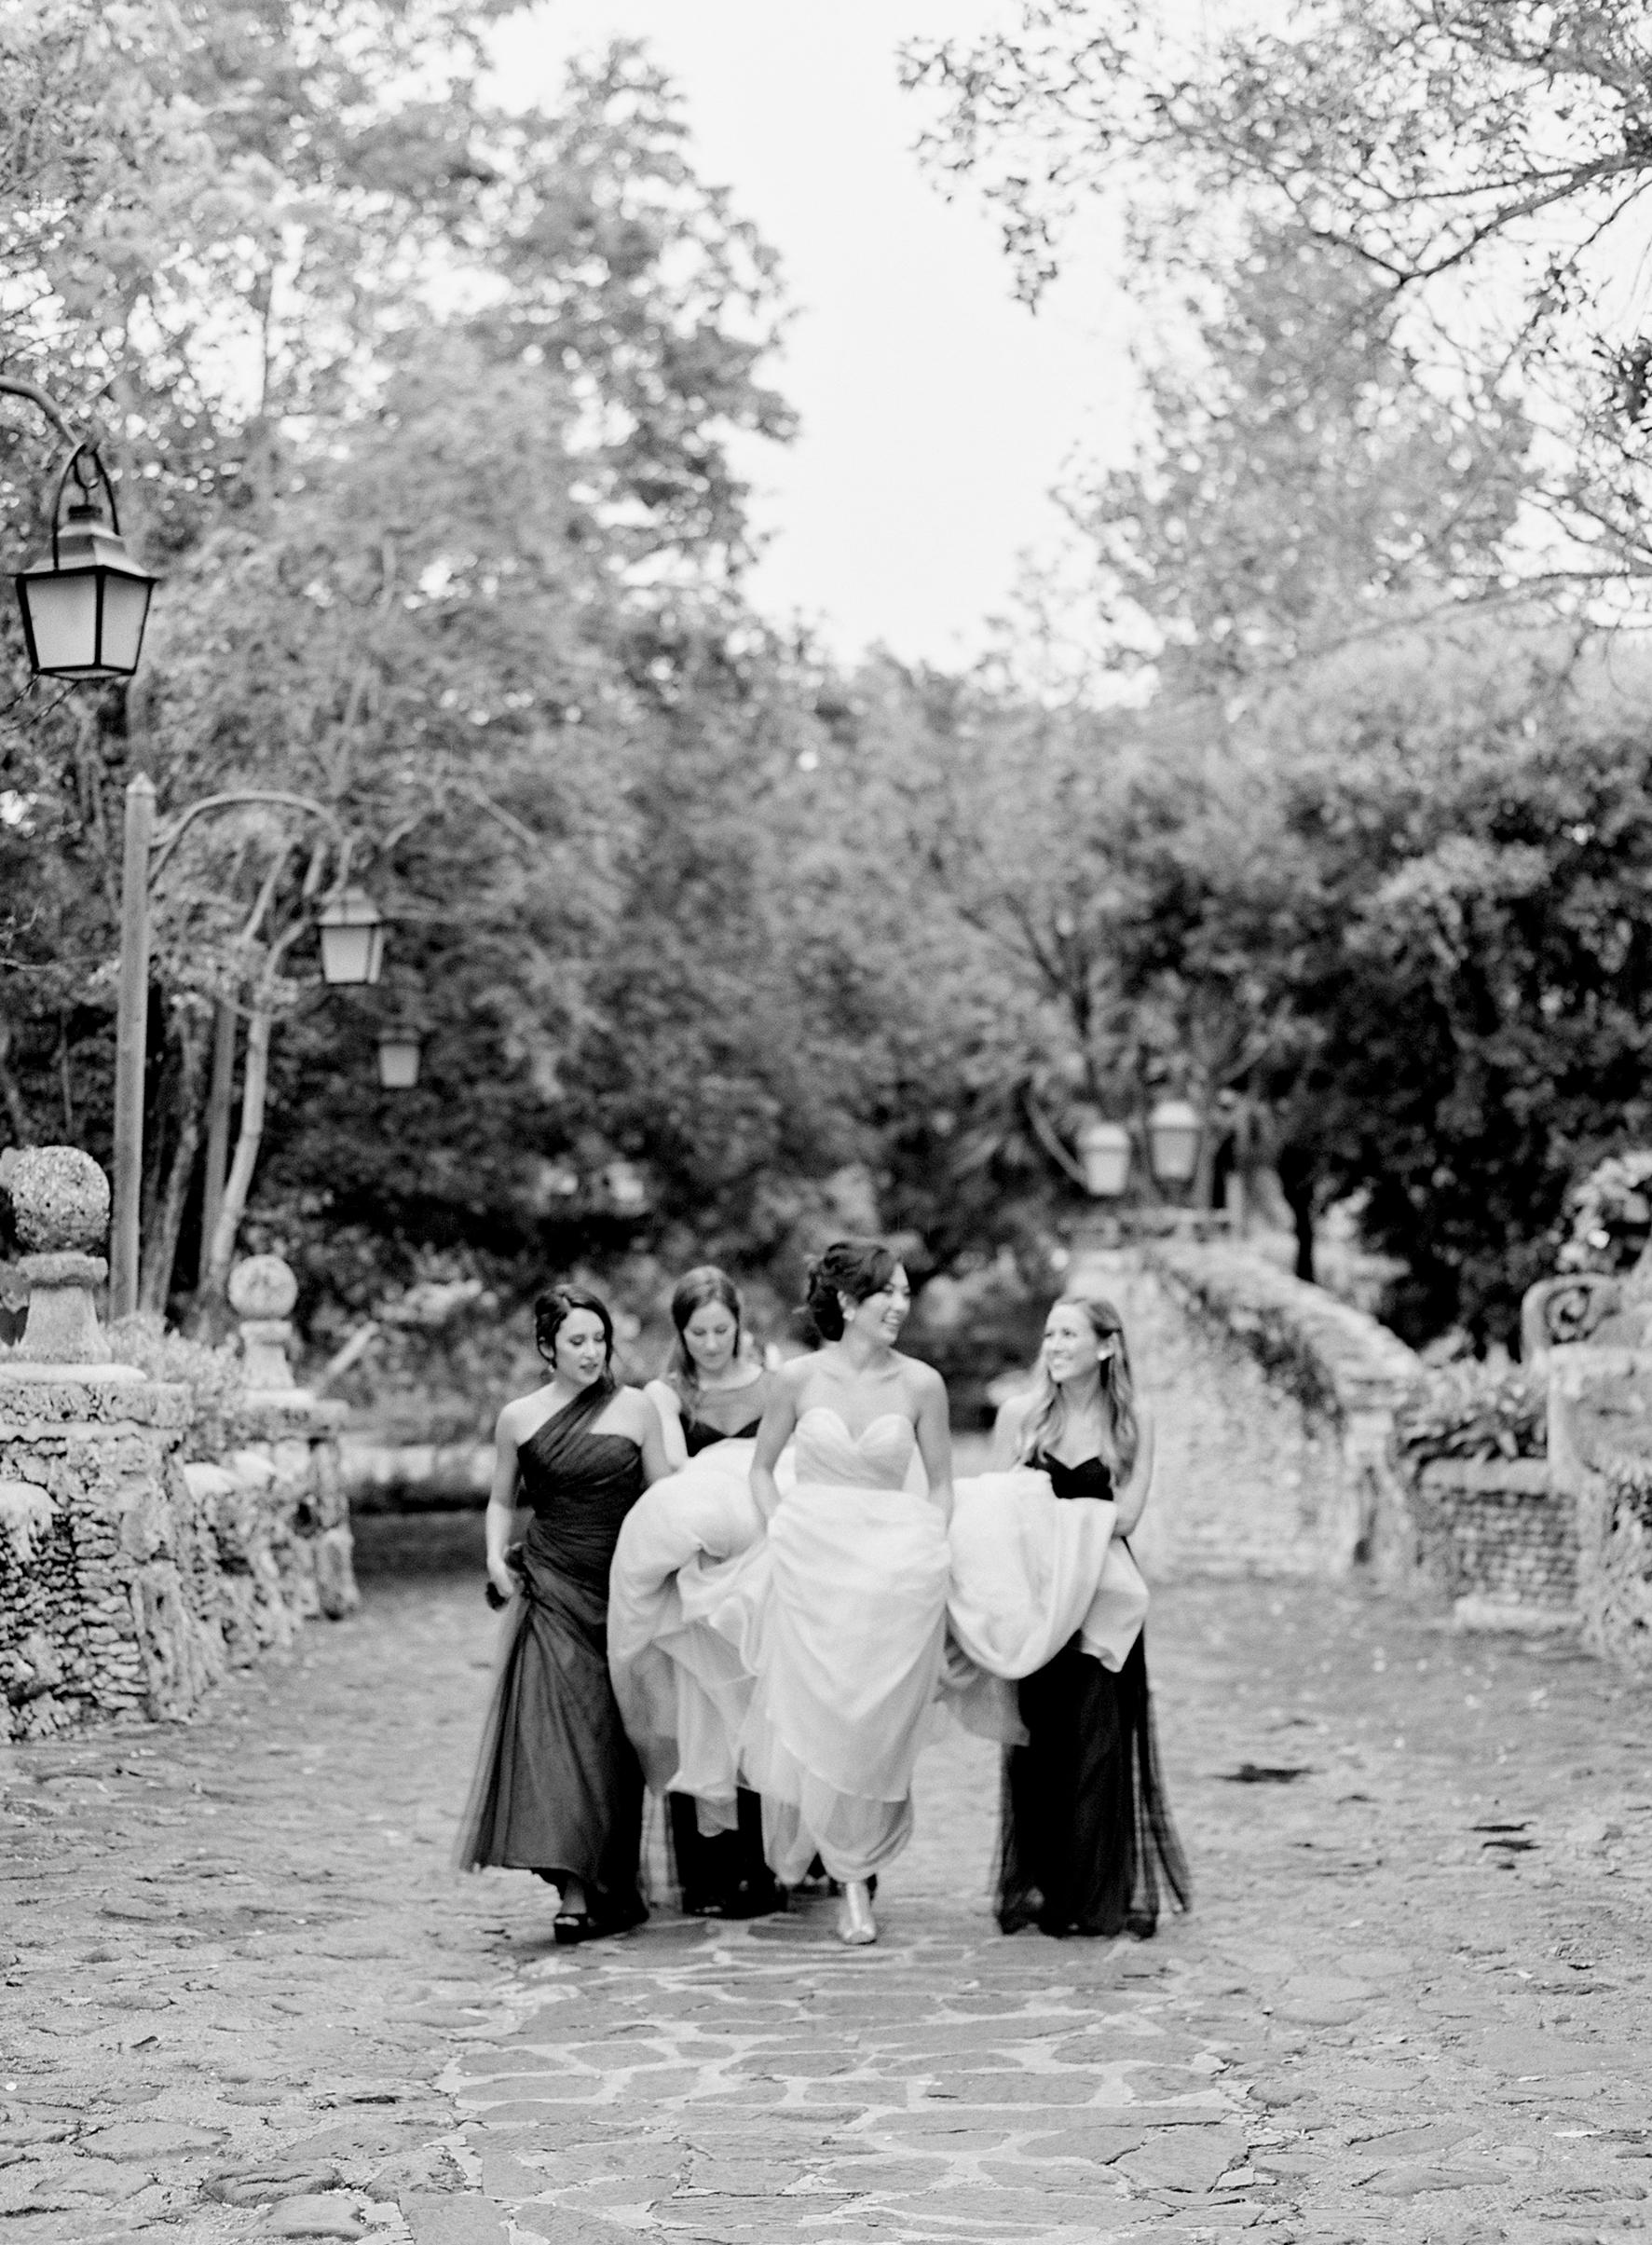 Ashleigh and Brian-Wedding Day-Carrie King Photographer-487.jpg